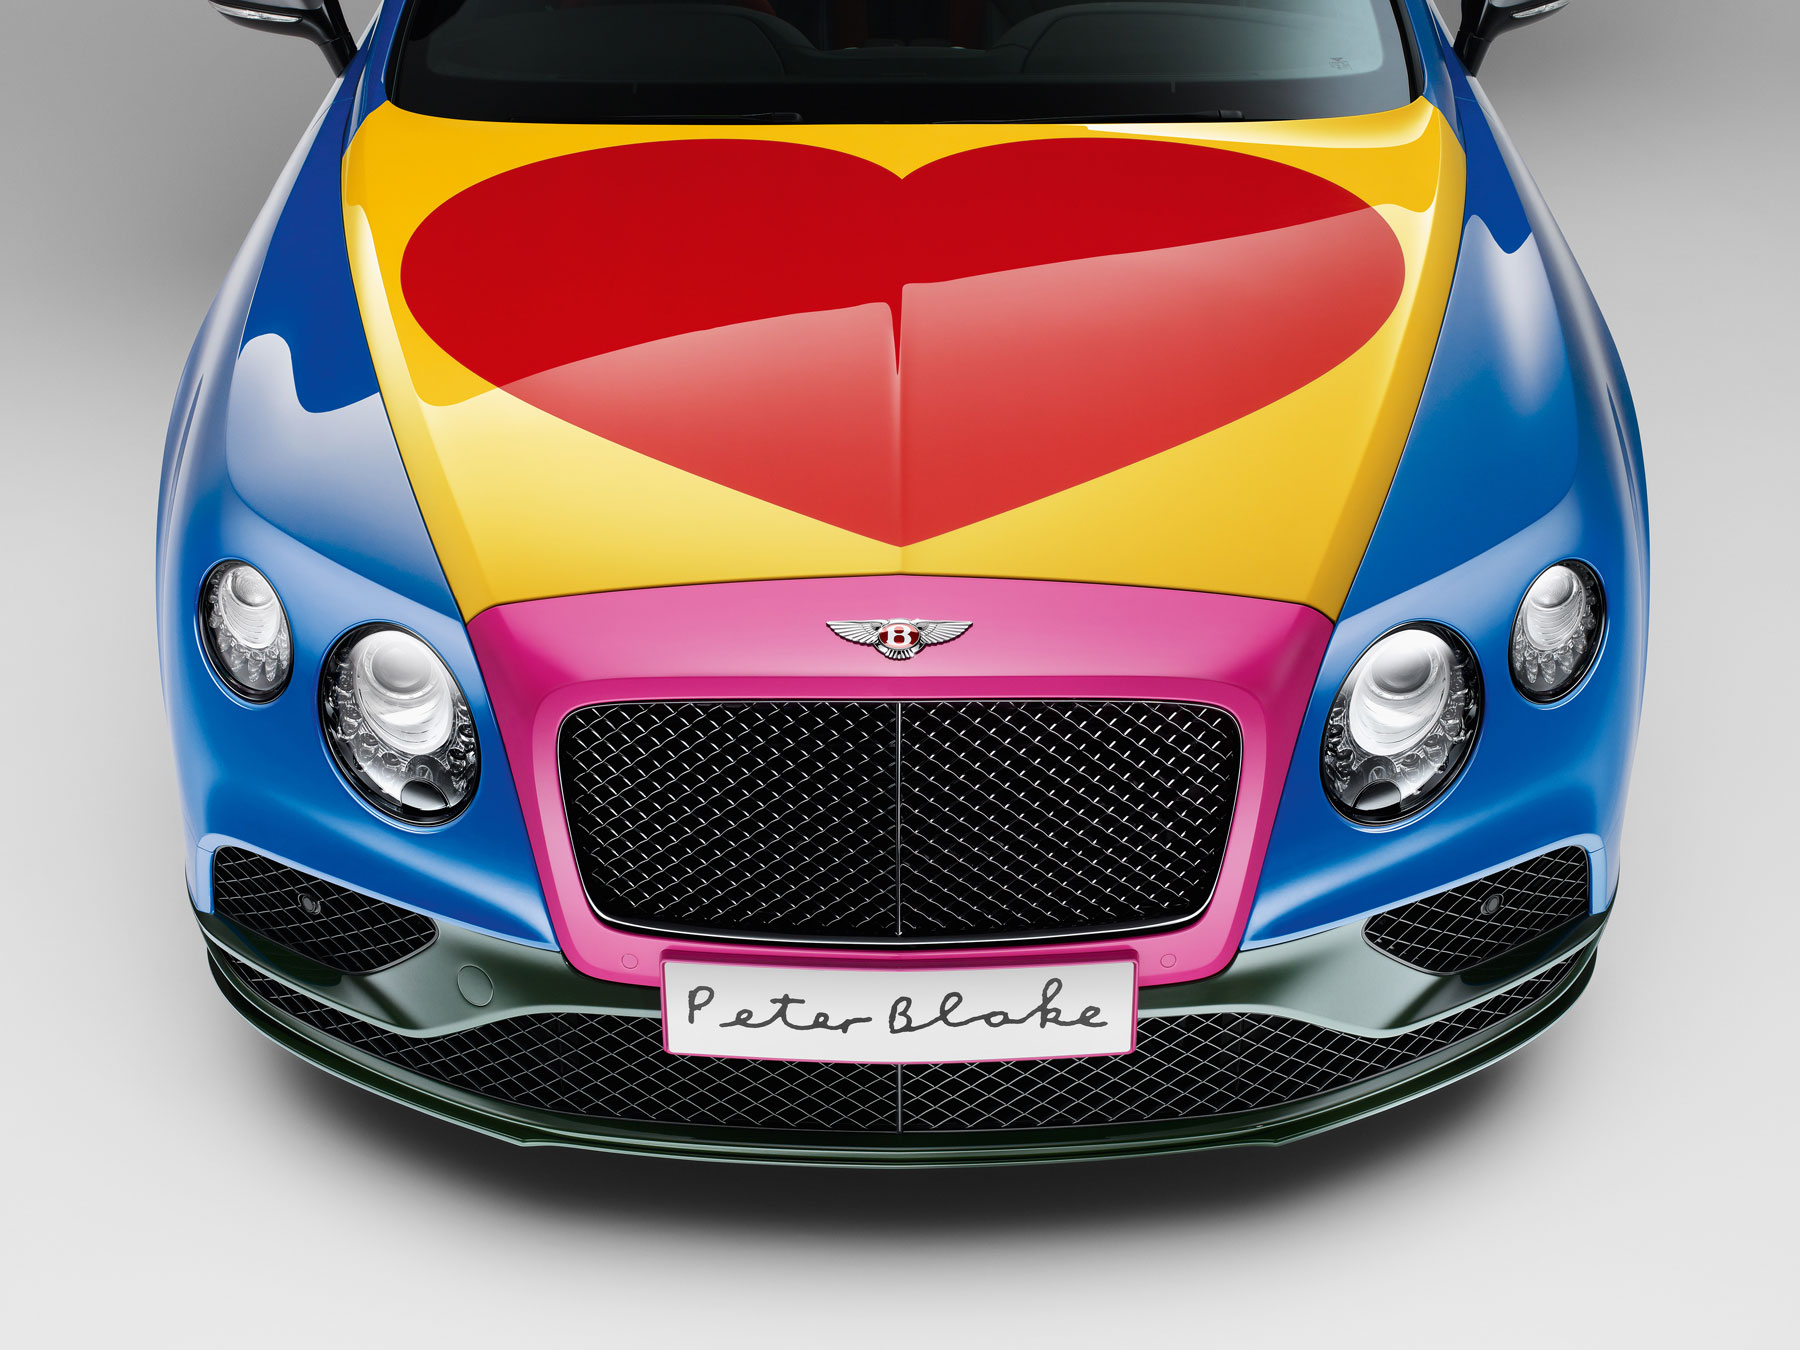 Pop Art Bentley – created by artist Sir Peter Blake